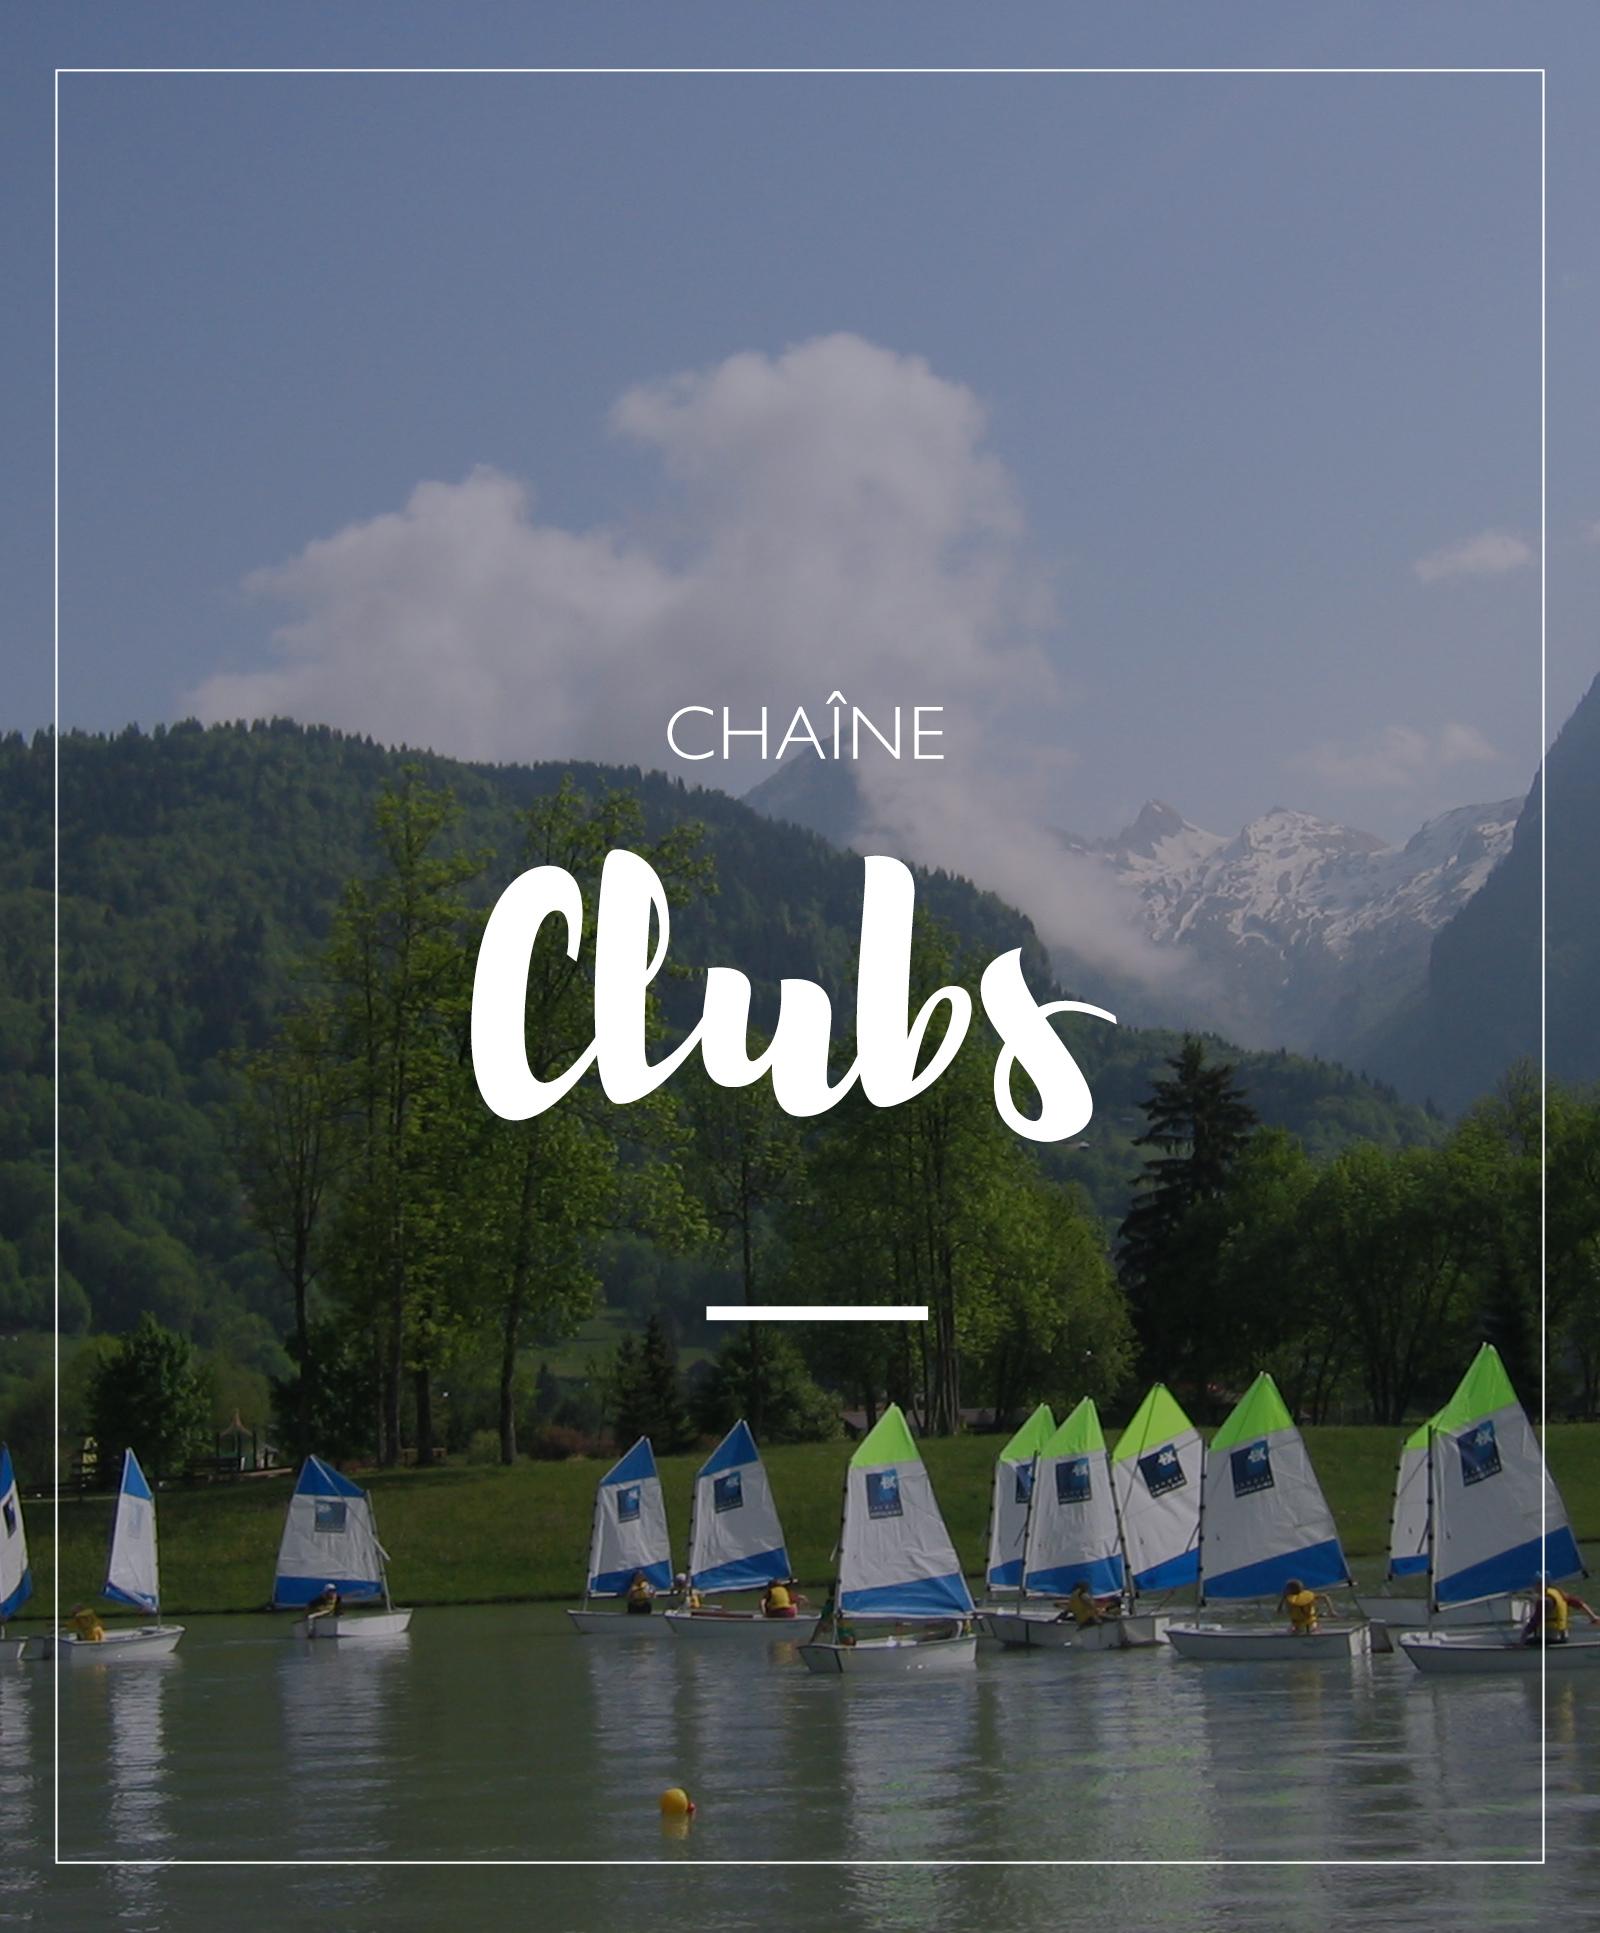 chaine Clubs